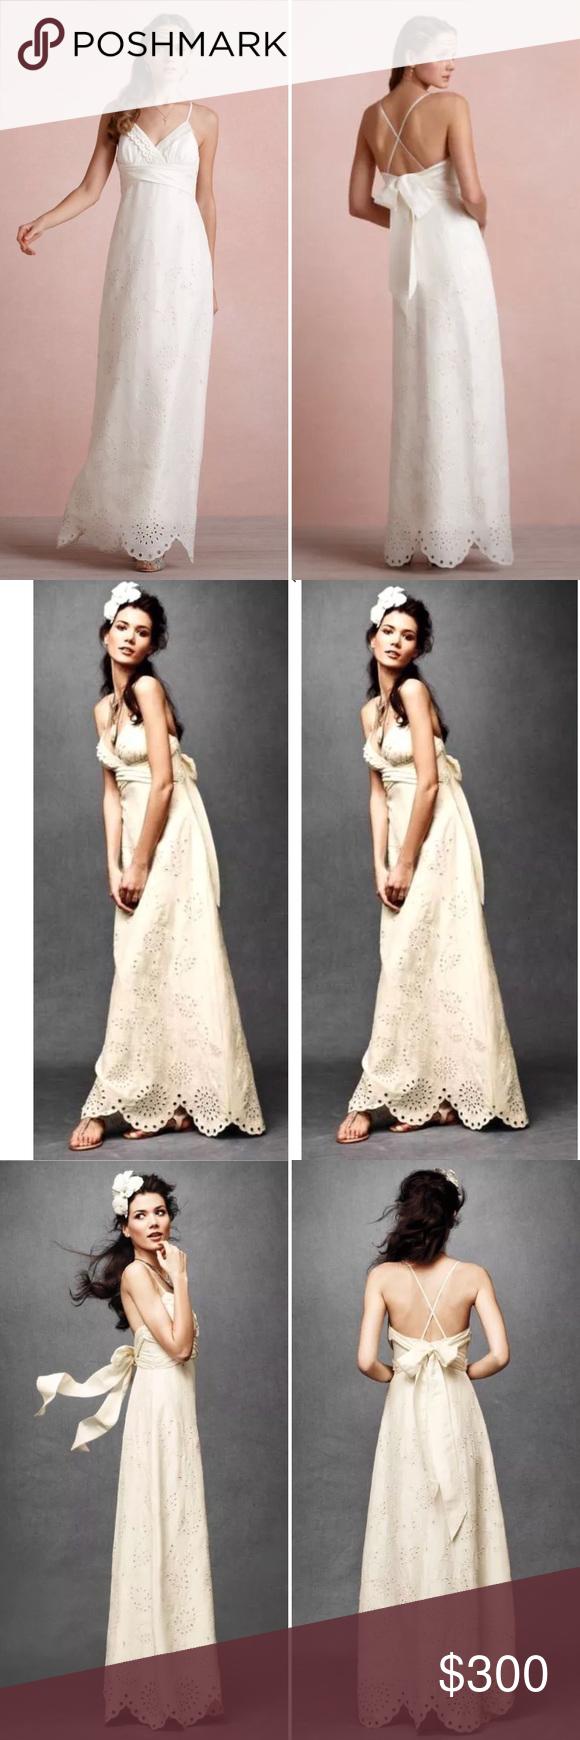 Silk sheath wedding dress  BHLDN Silk Linen Eyelet Medley Sheath Wedding Gown  Sheath wedding